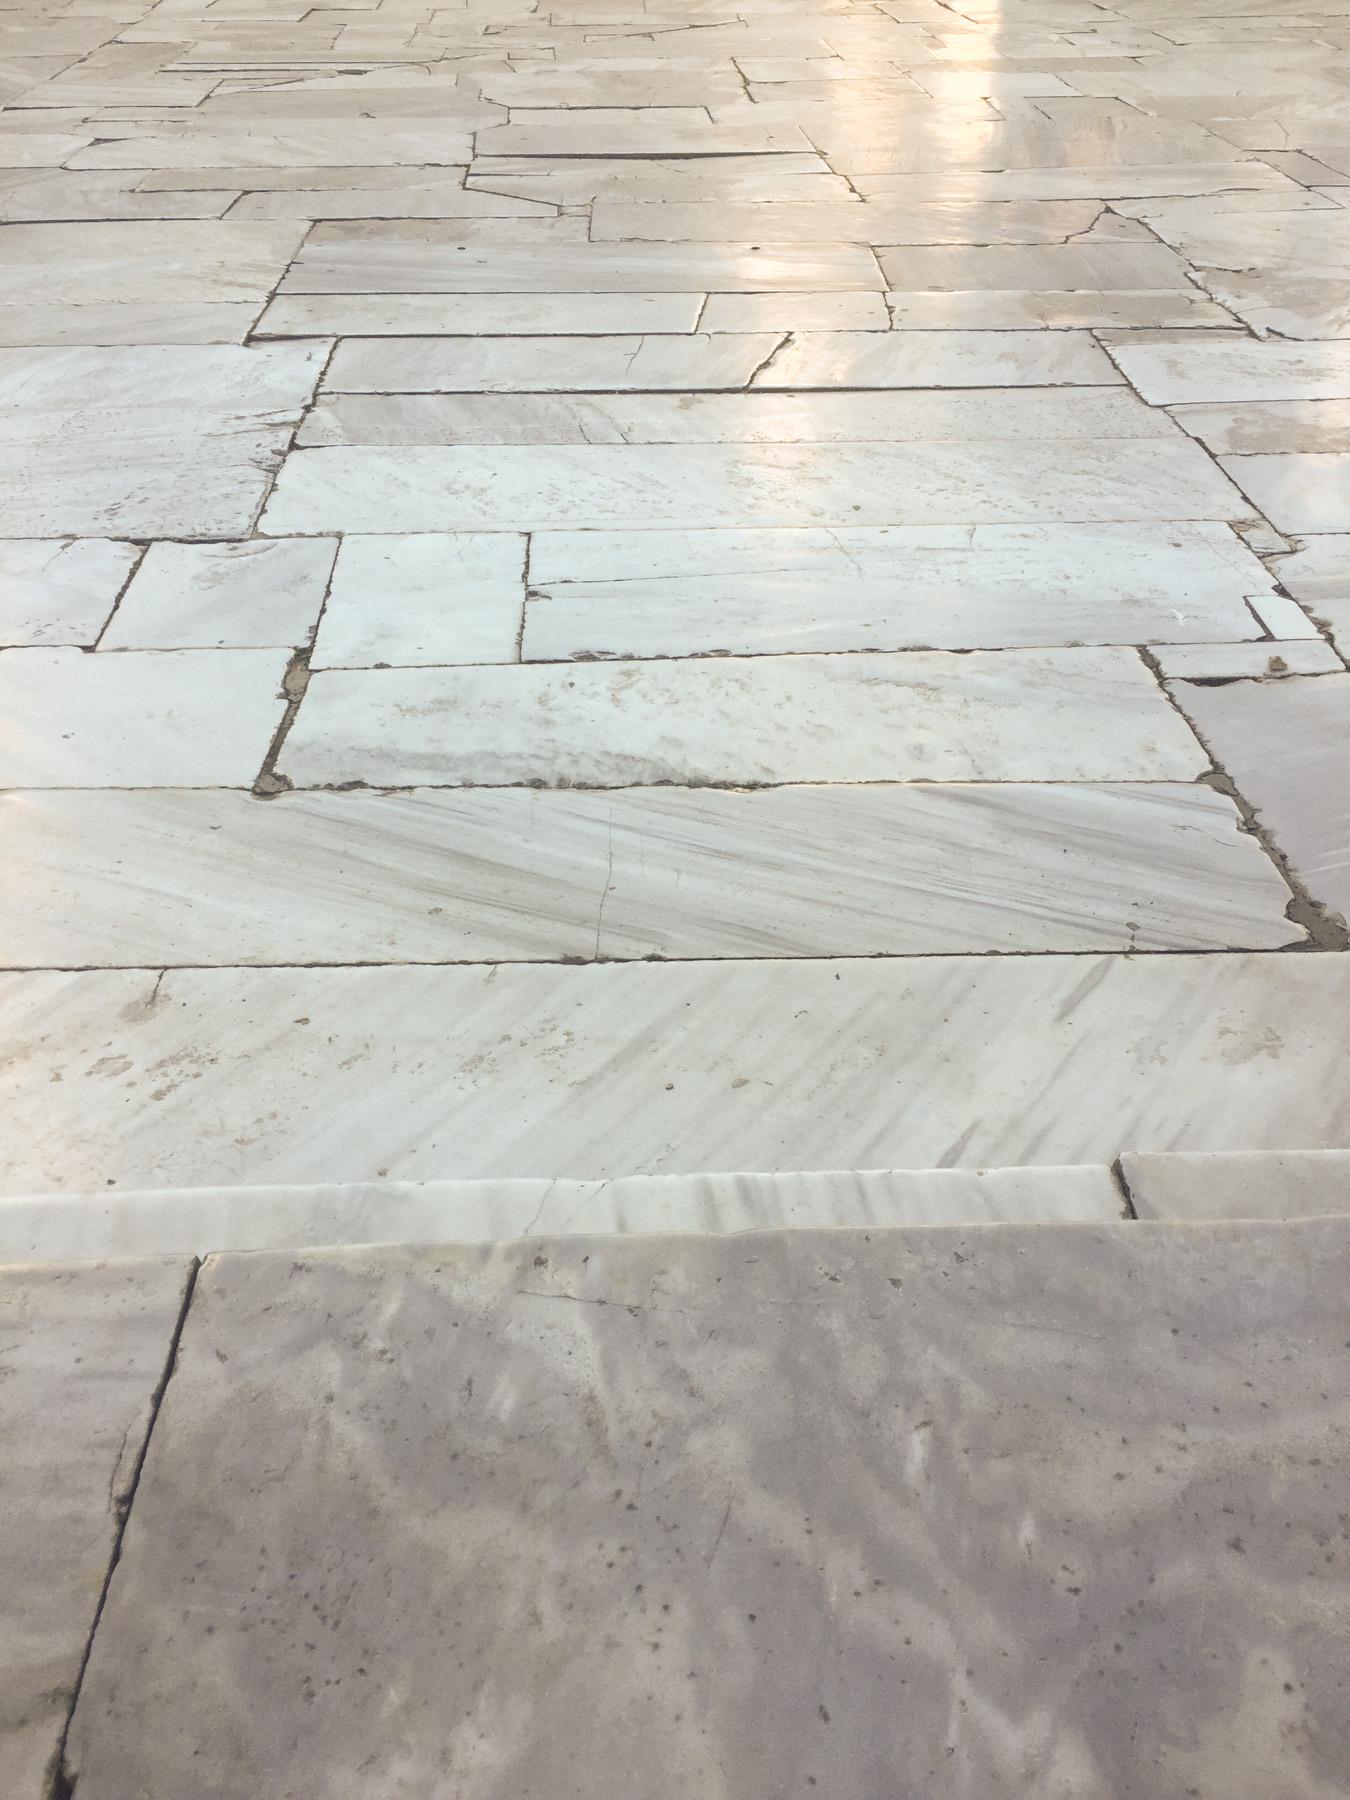 try wonder inspo istanbul turkey blue mosque marble floor